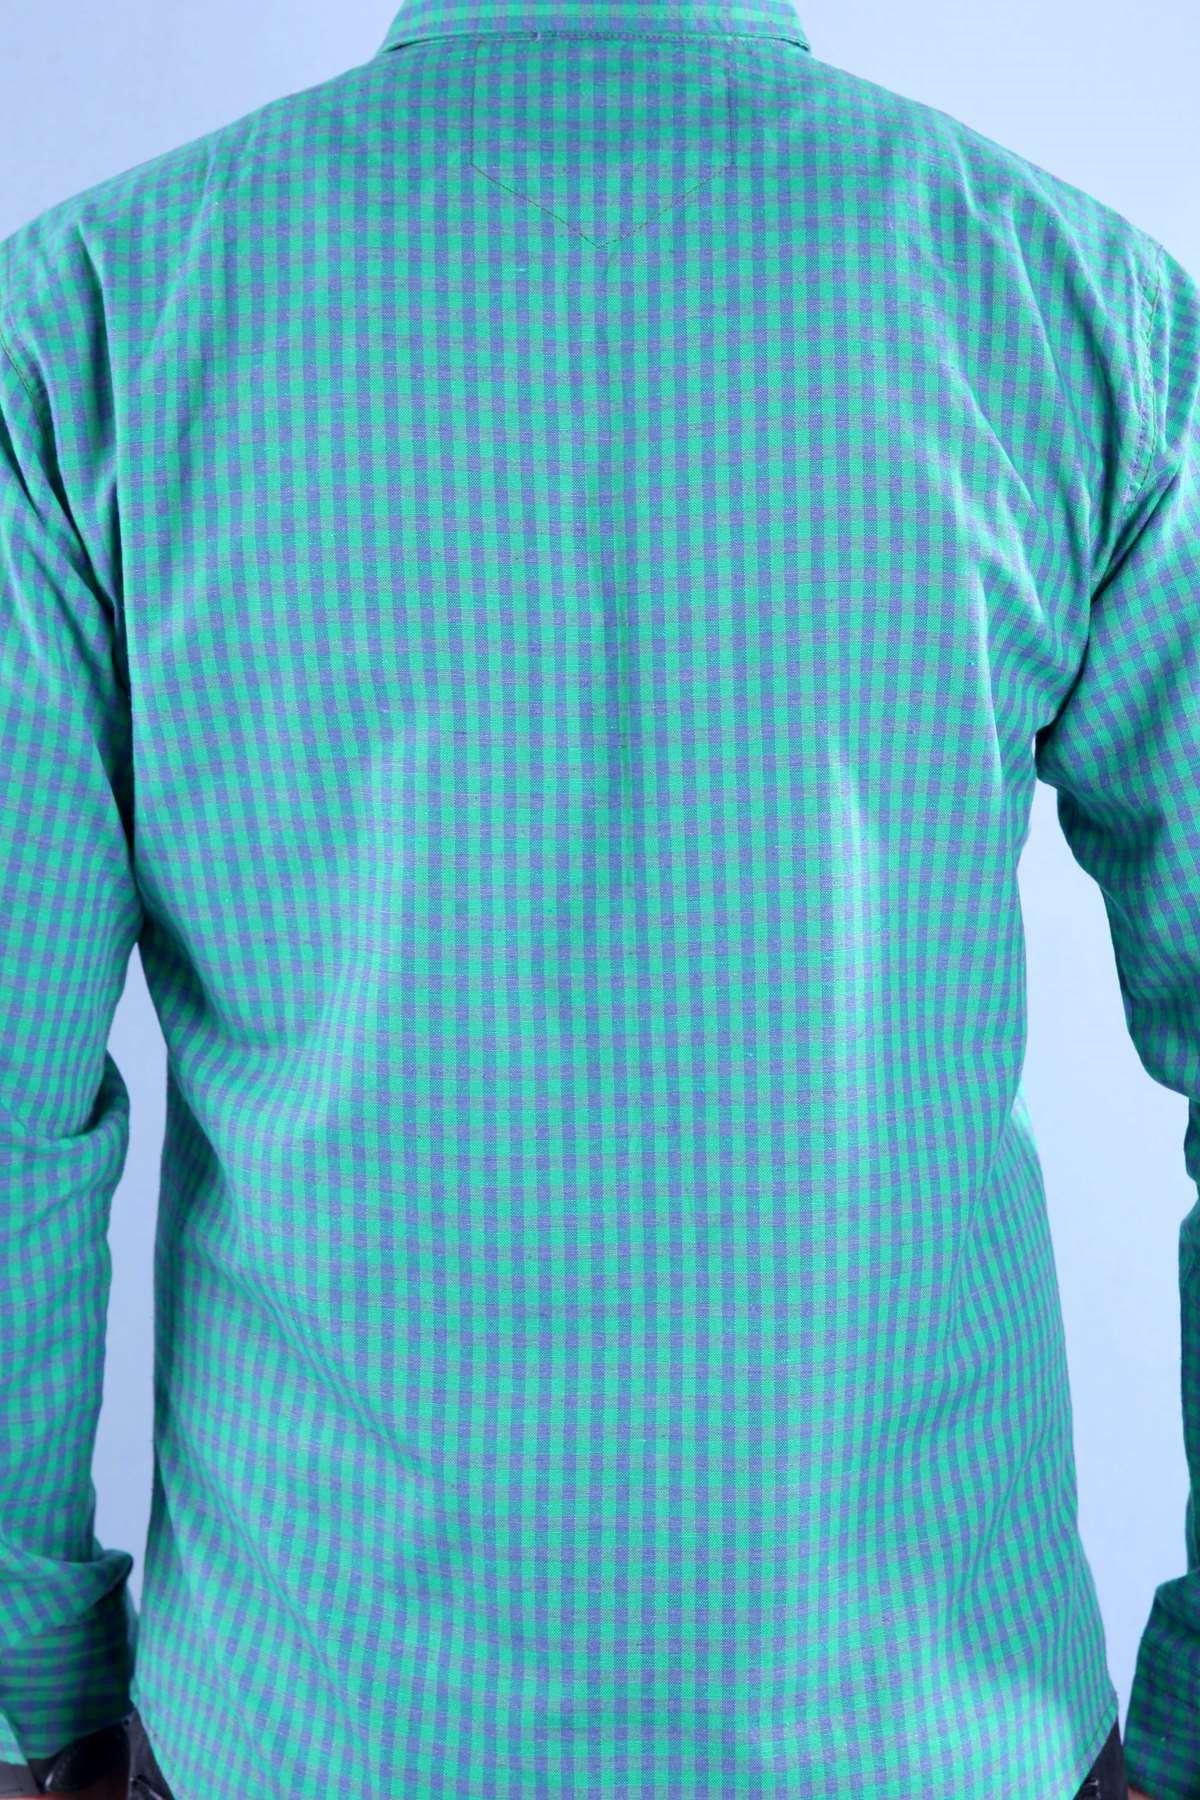 Piti Kare Desenli İki Renkli Slim Fit Gömlek Yeşil-Laci